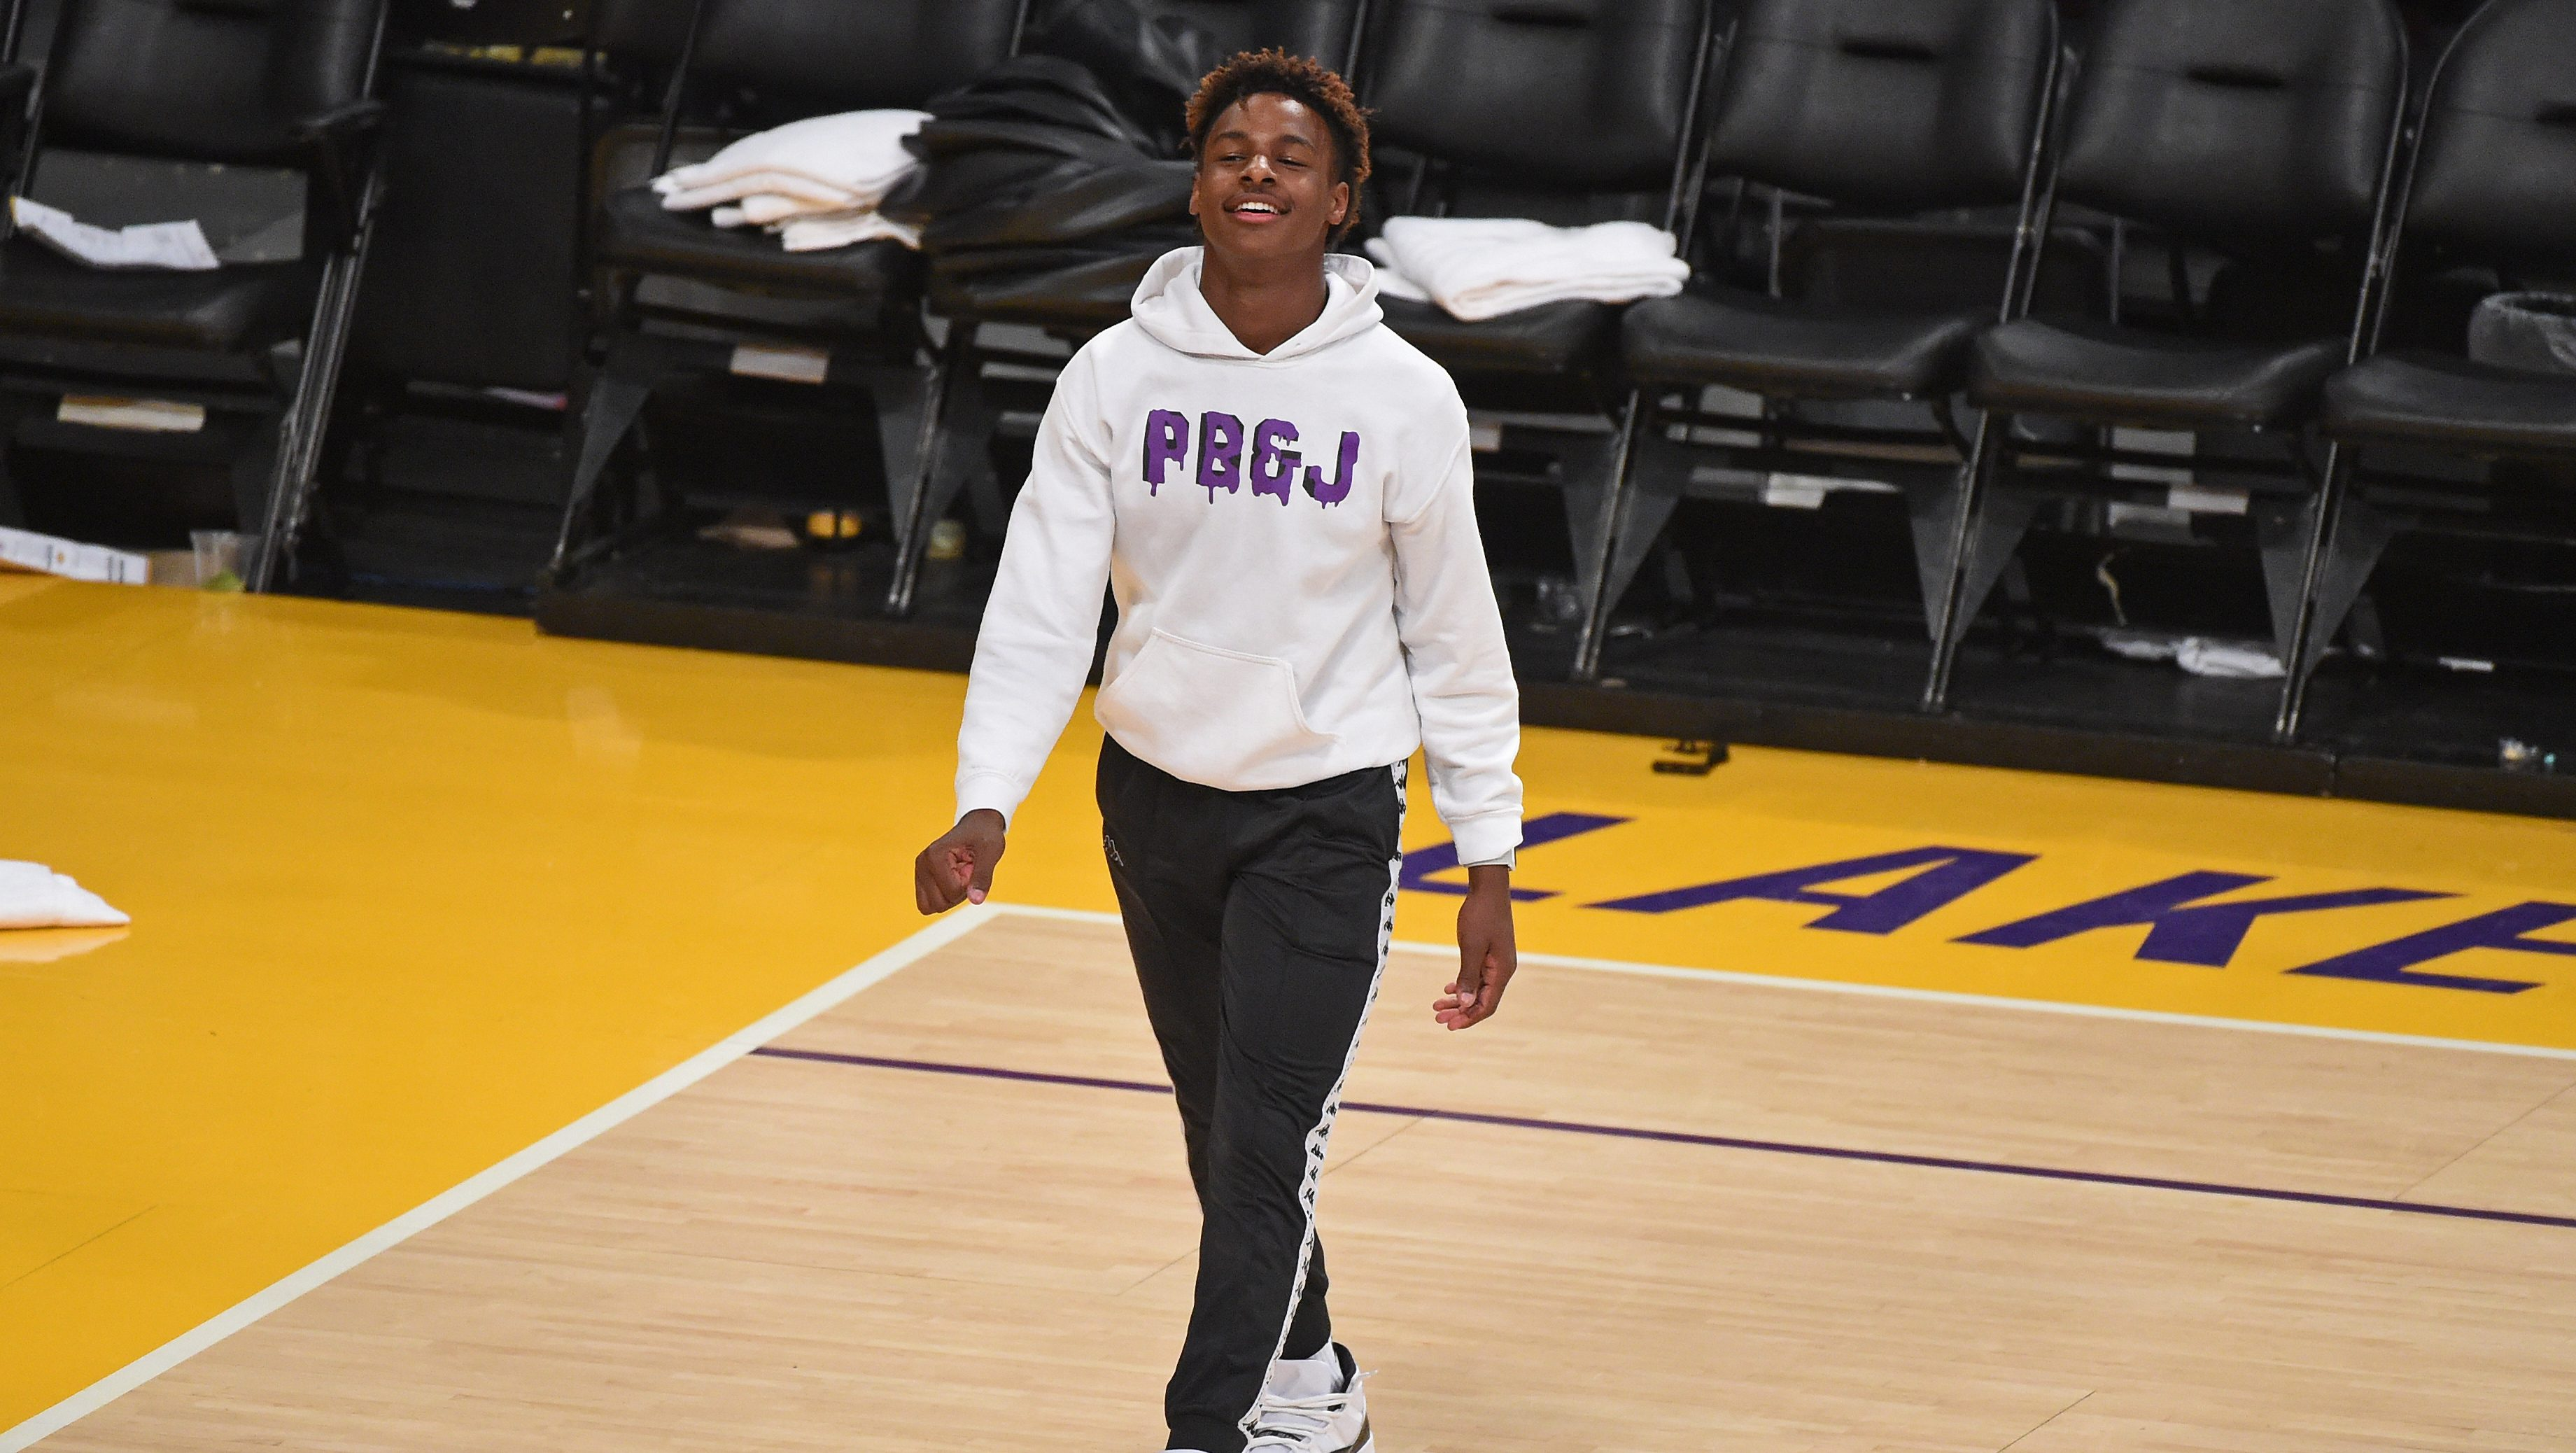 2019 New Backpack LeBron James 23 Basketball School Bags 100/% High Quality